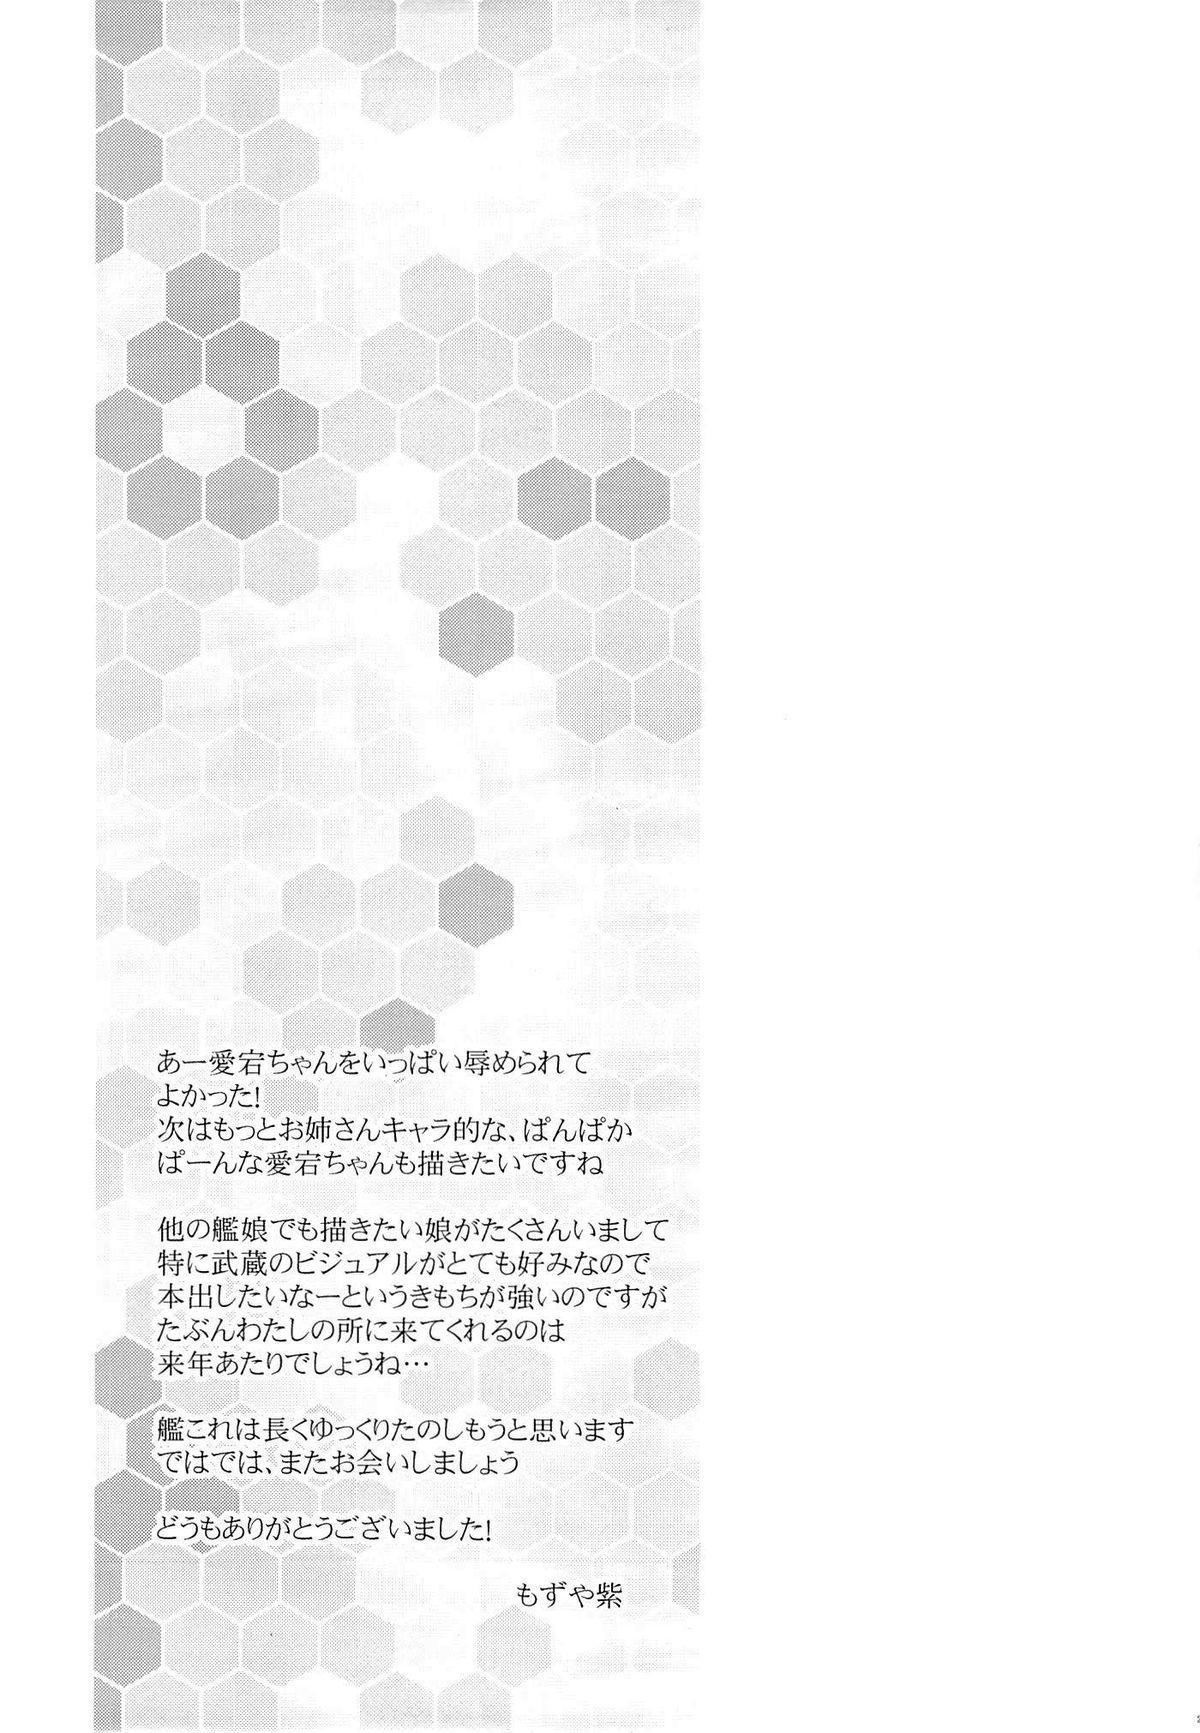 (Houraigekisen! Yo-i! 4Senme!) [MOZUCHICHI (Mozuya Murasaki)] Shimakaze...A, Atago-chan deshita ka...   Shimakaze... ah, Atago-chan, Were You... (Kantai Collection) [English] {doujin-moe.us} 22